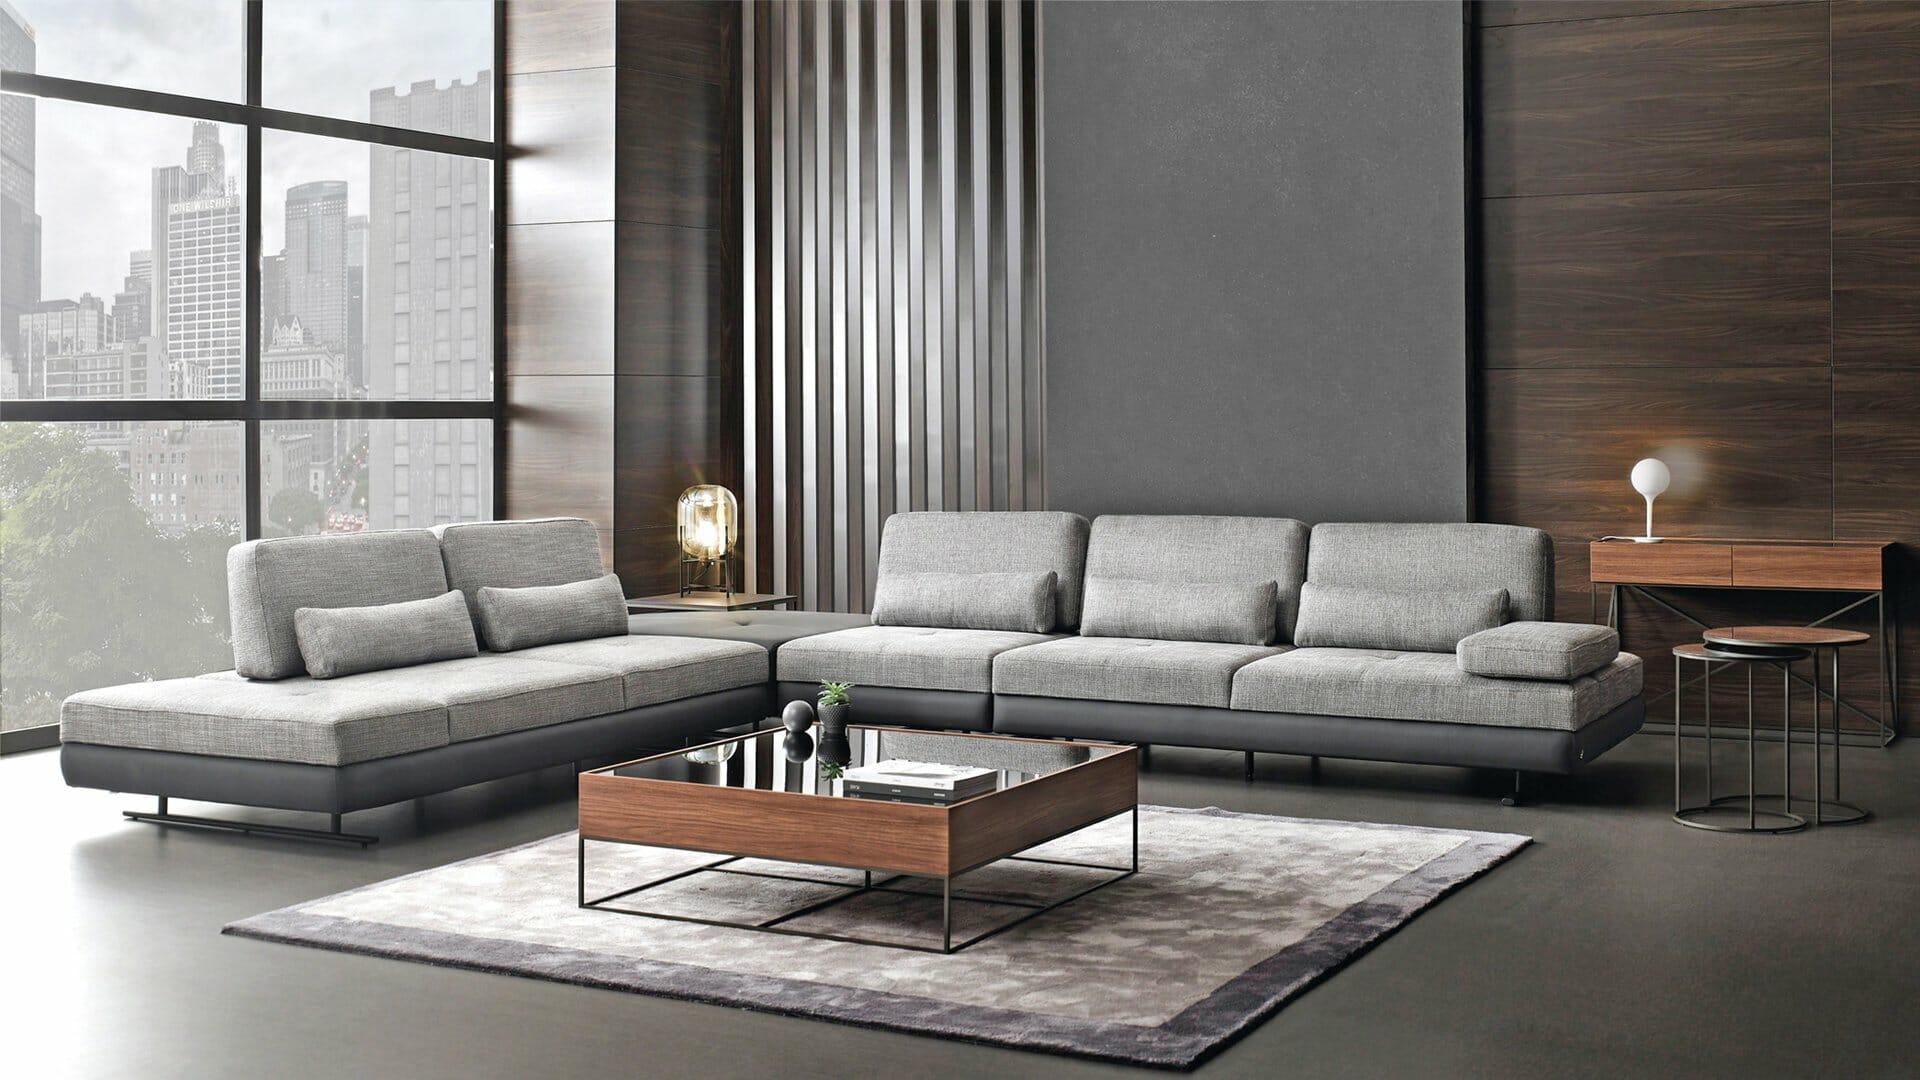 nyc furniture stores - lazzoni